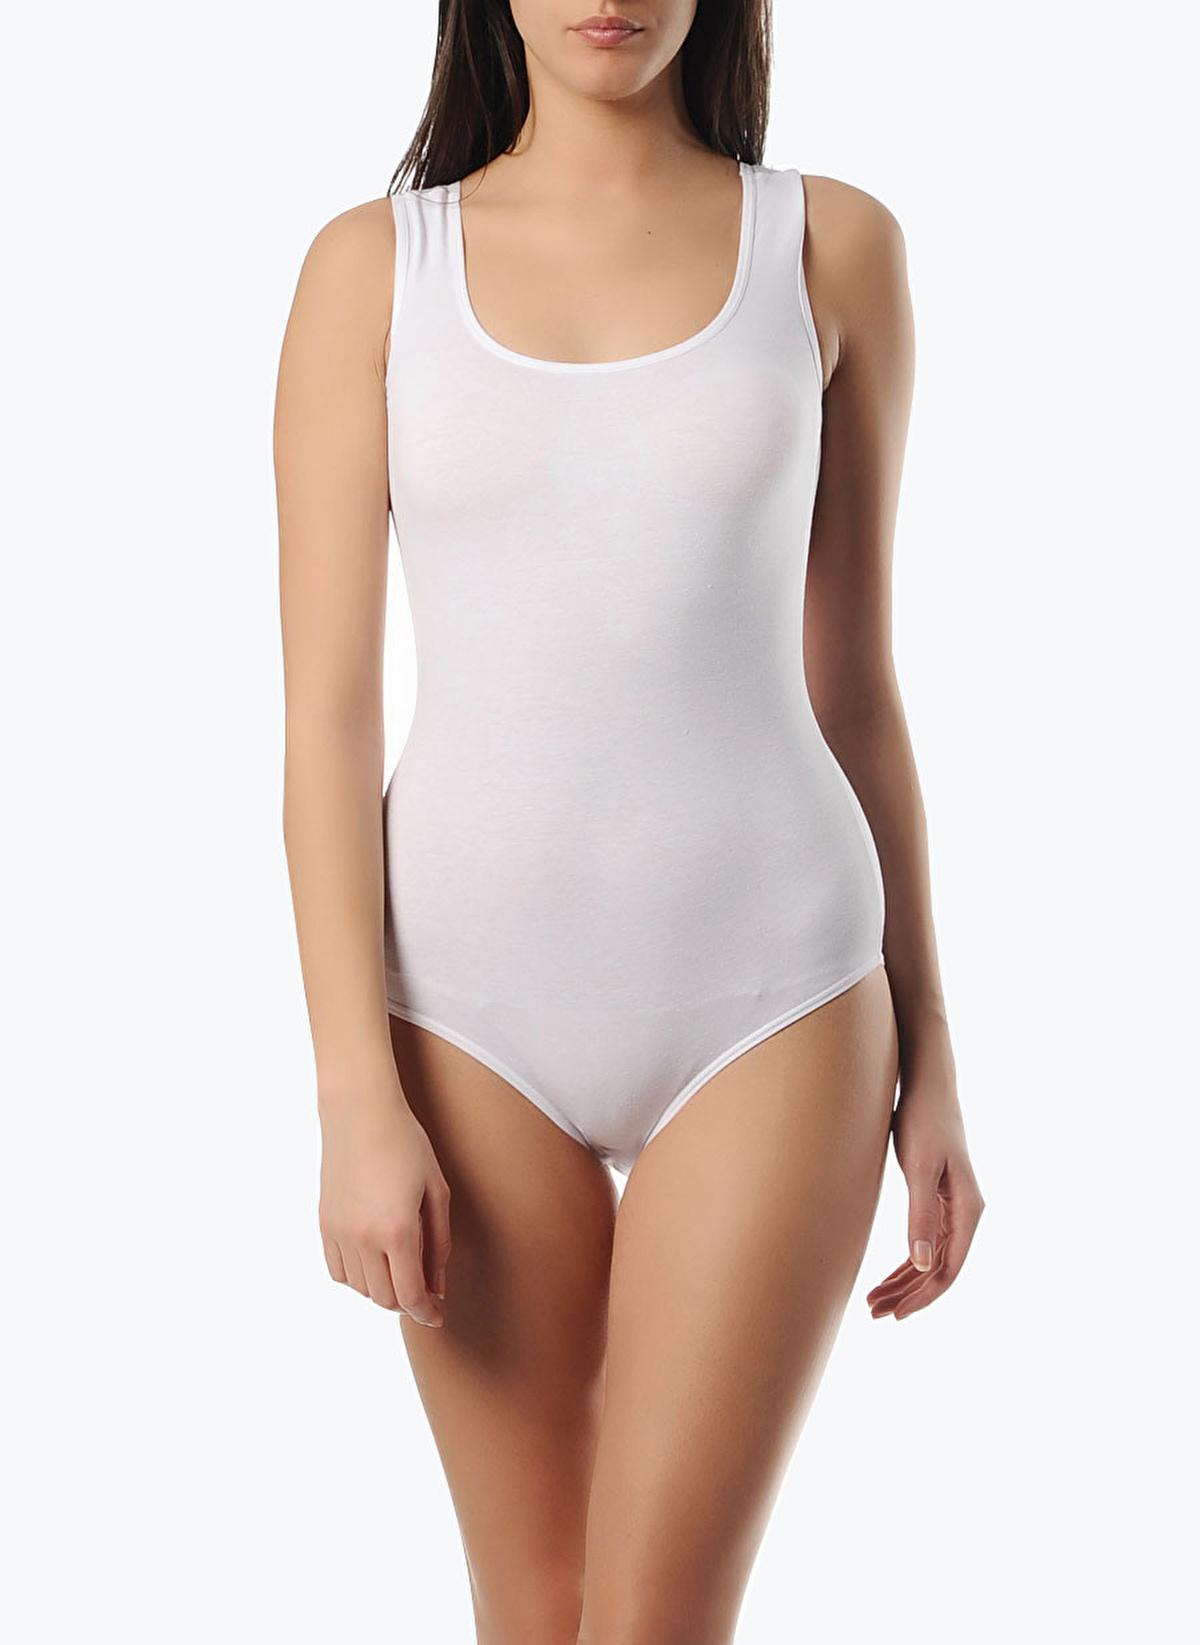 Doreanse Body Mdor12110 Bayan Body – 46.9 TL